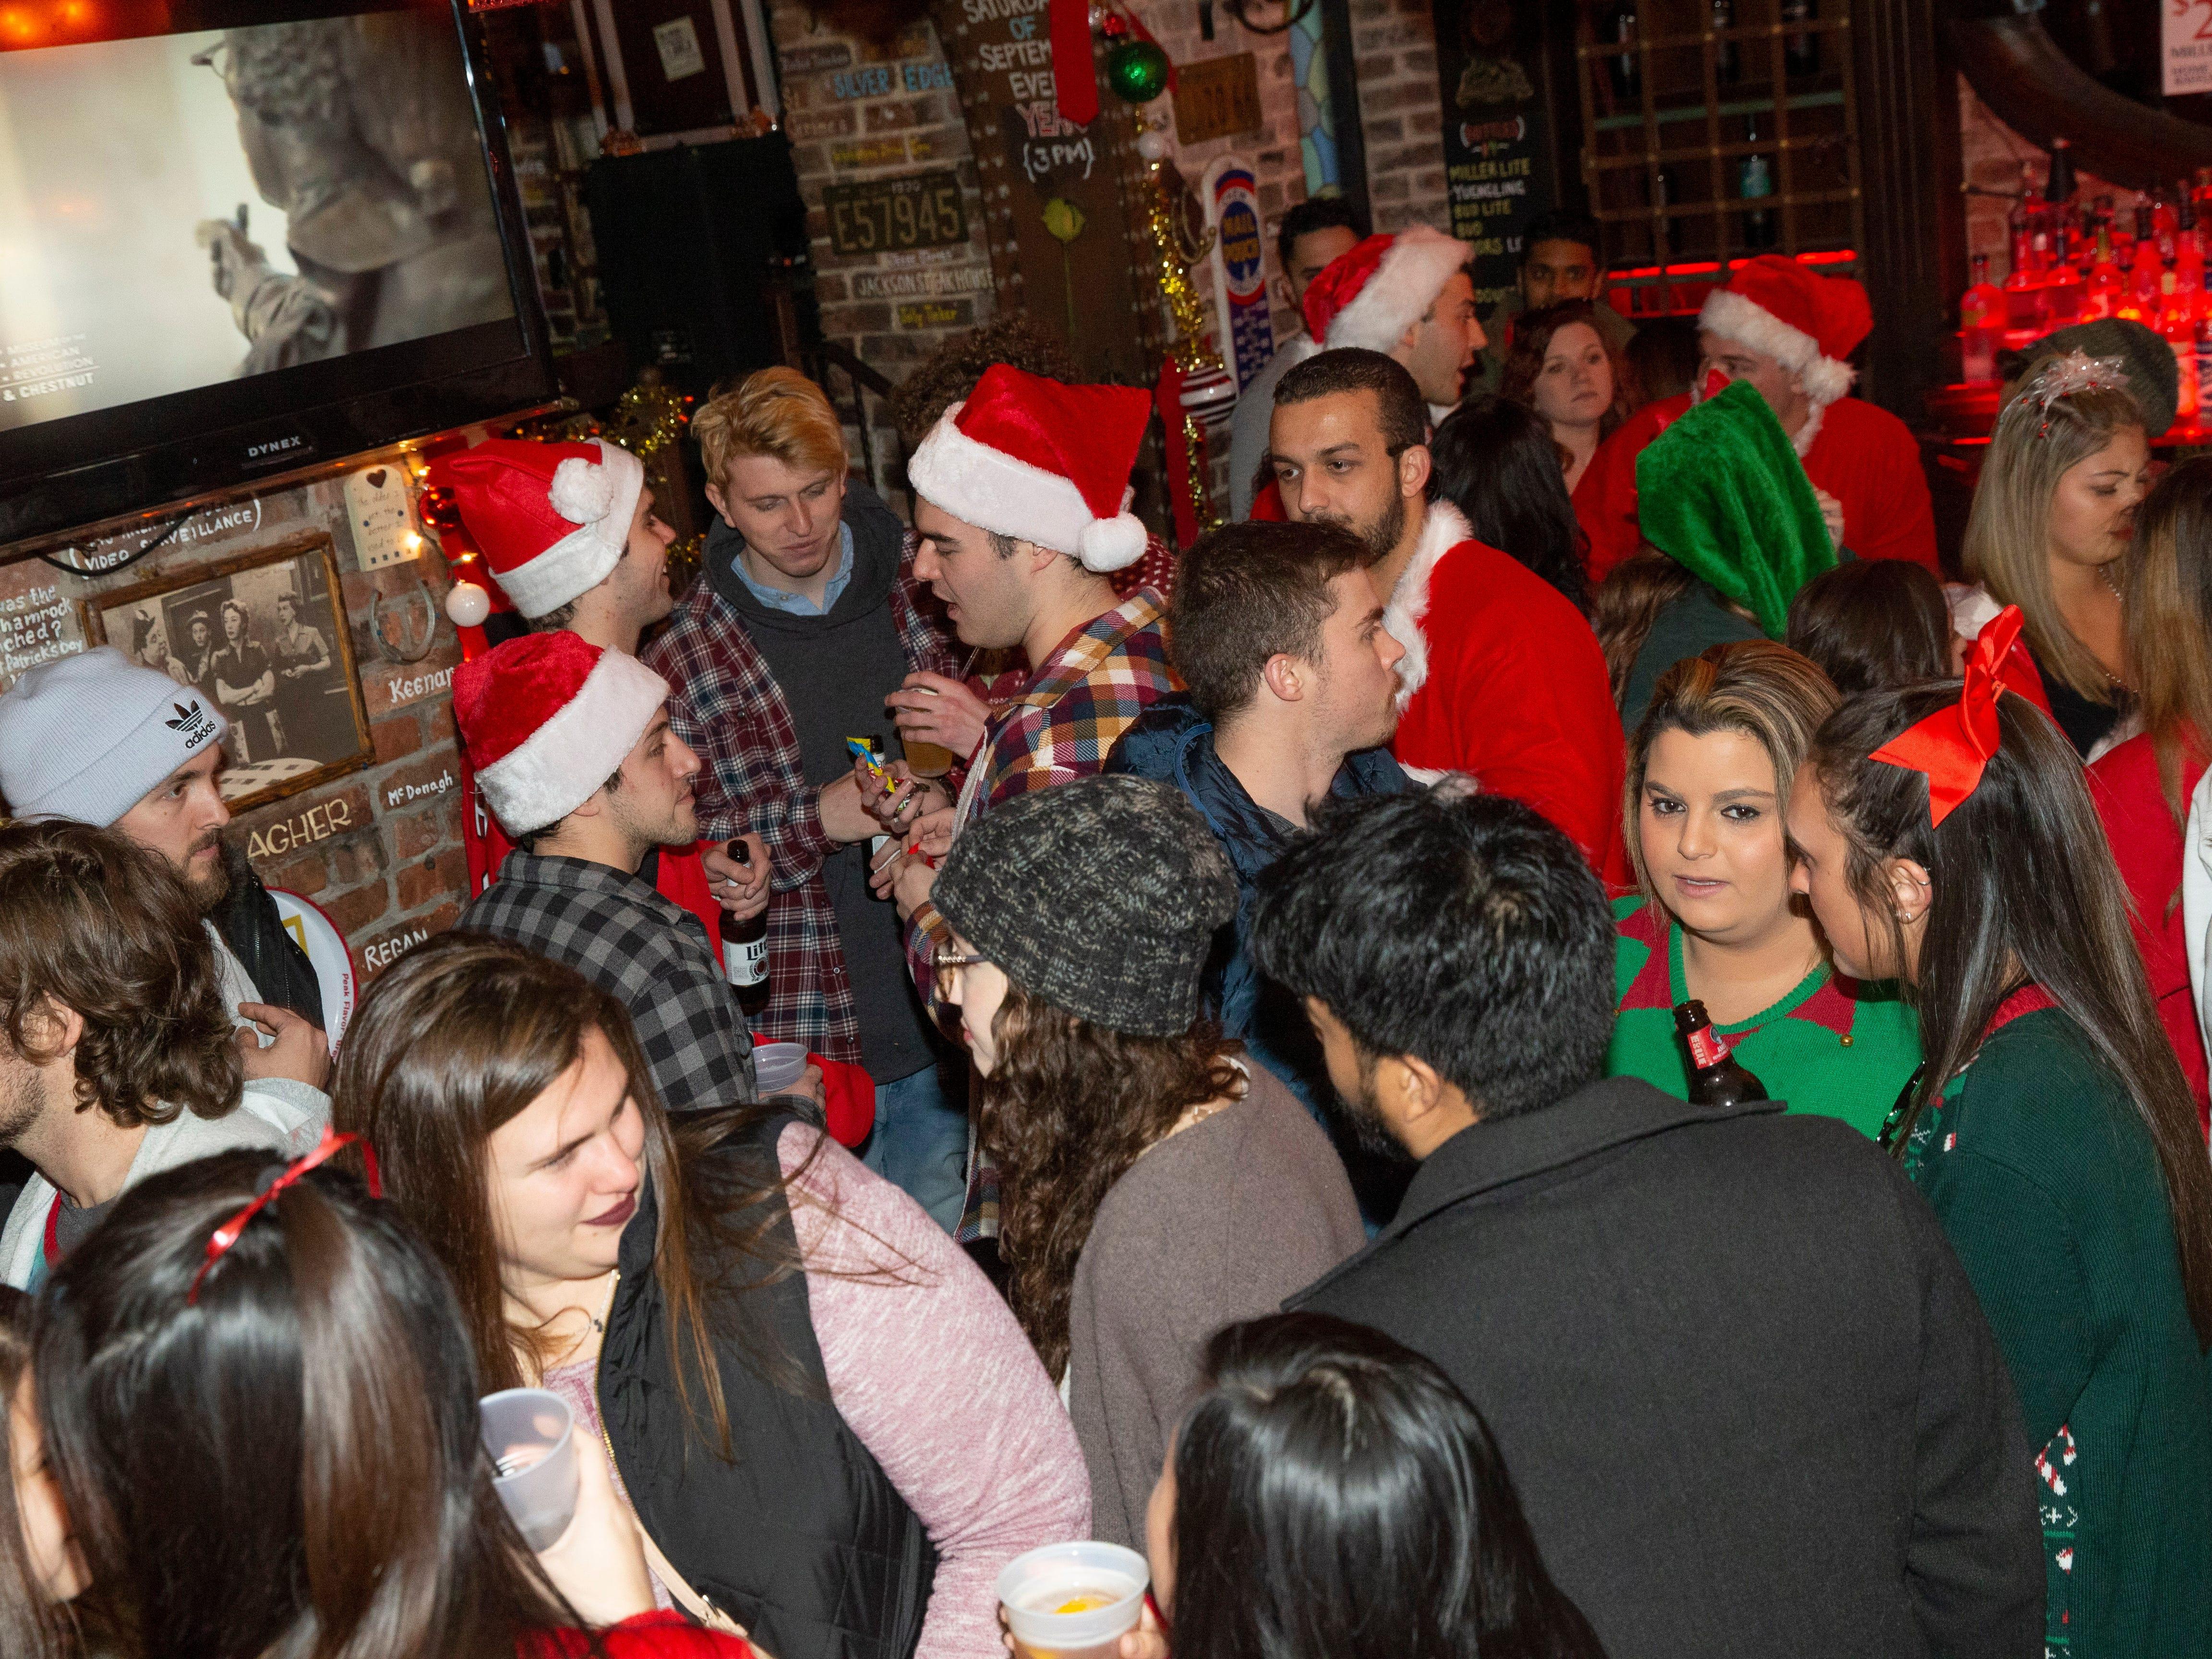 Patrons at Johnny Mac House of Spirits during SantaCon Bar Crawl through Asbury Park on December 8, 2018.